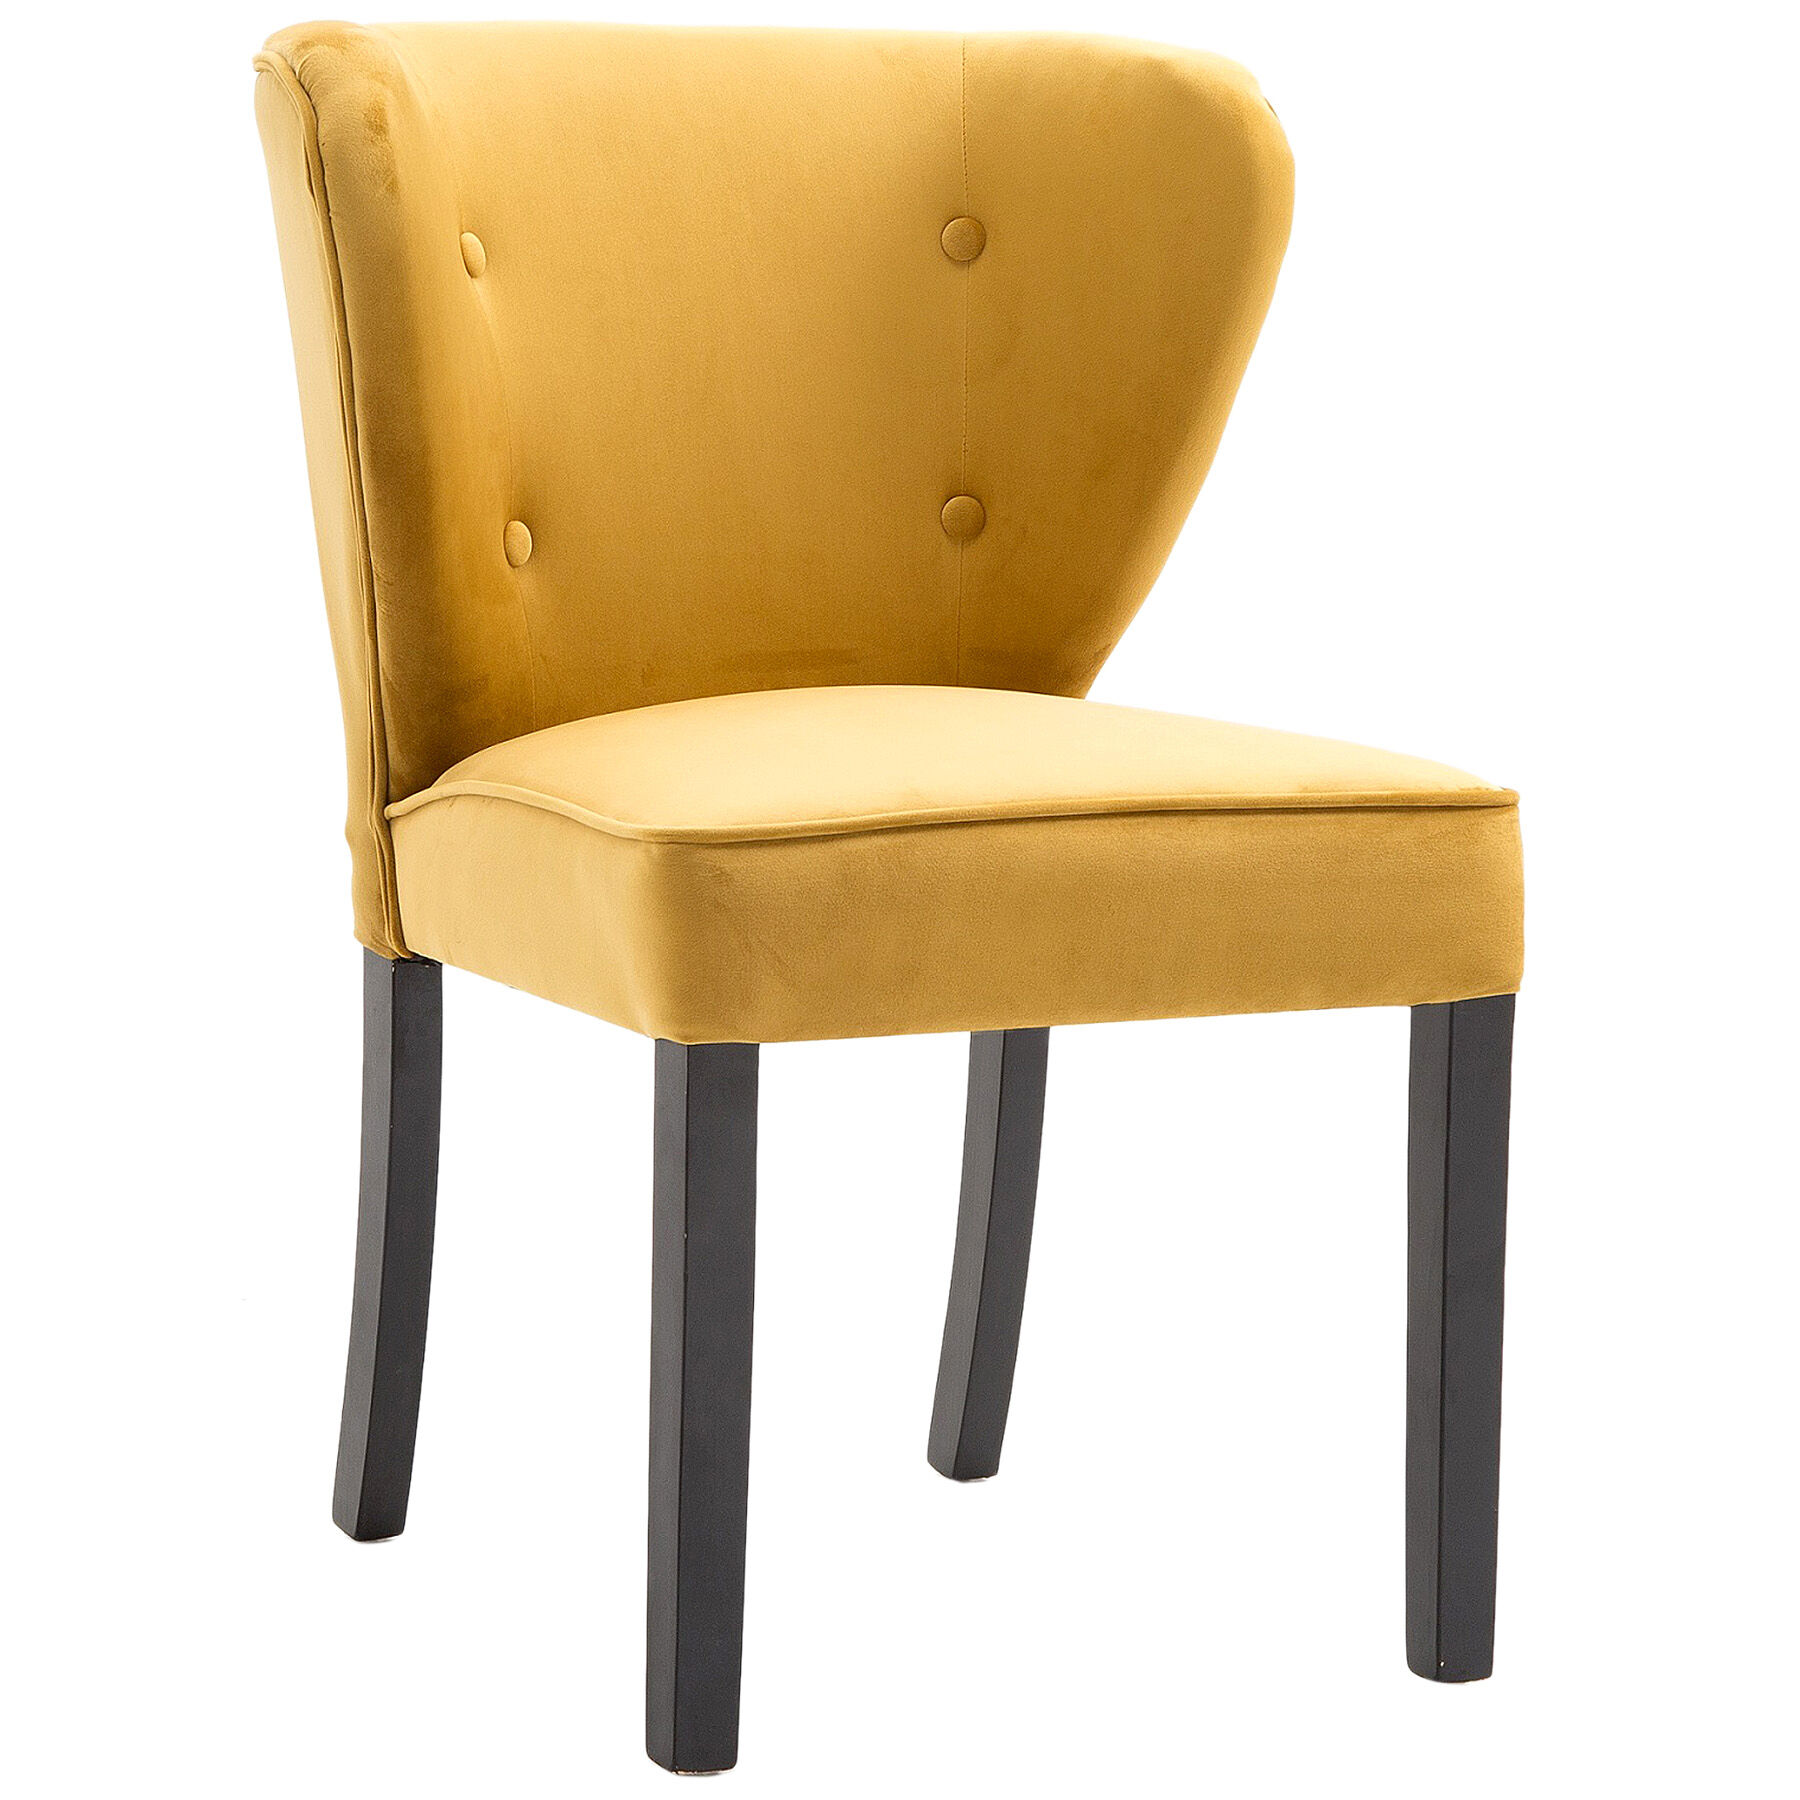 tufted yellow chair hawaii bennett velvet at home zoom